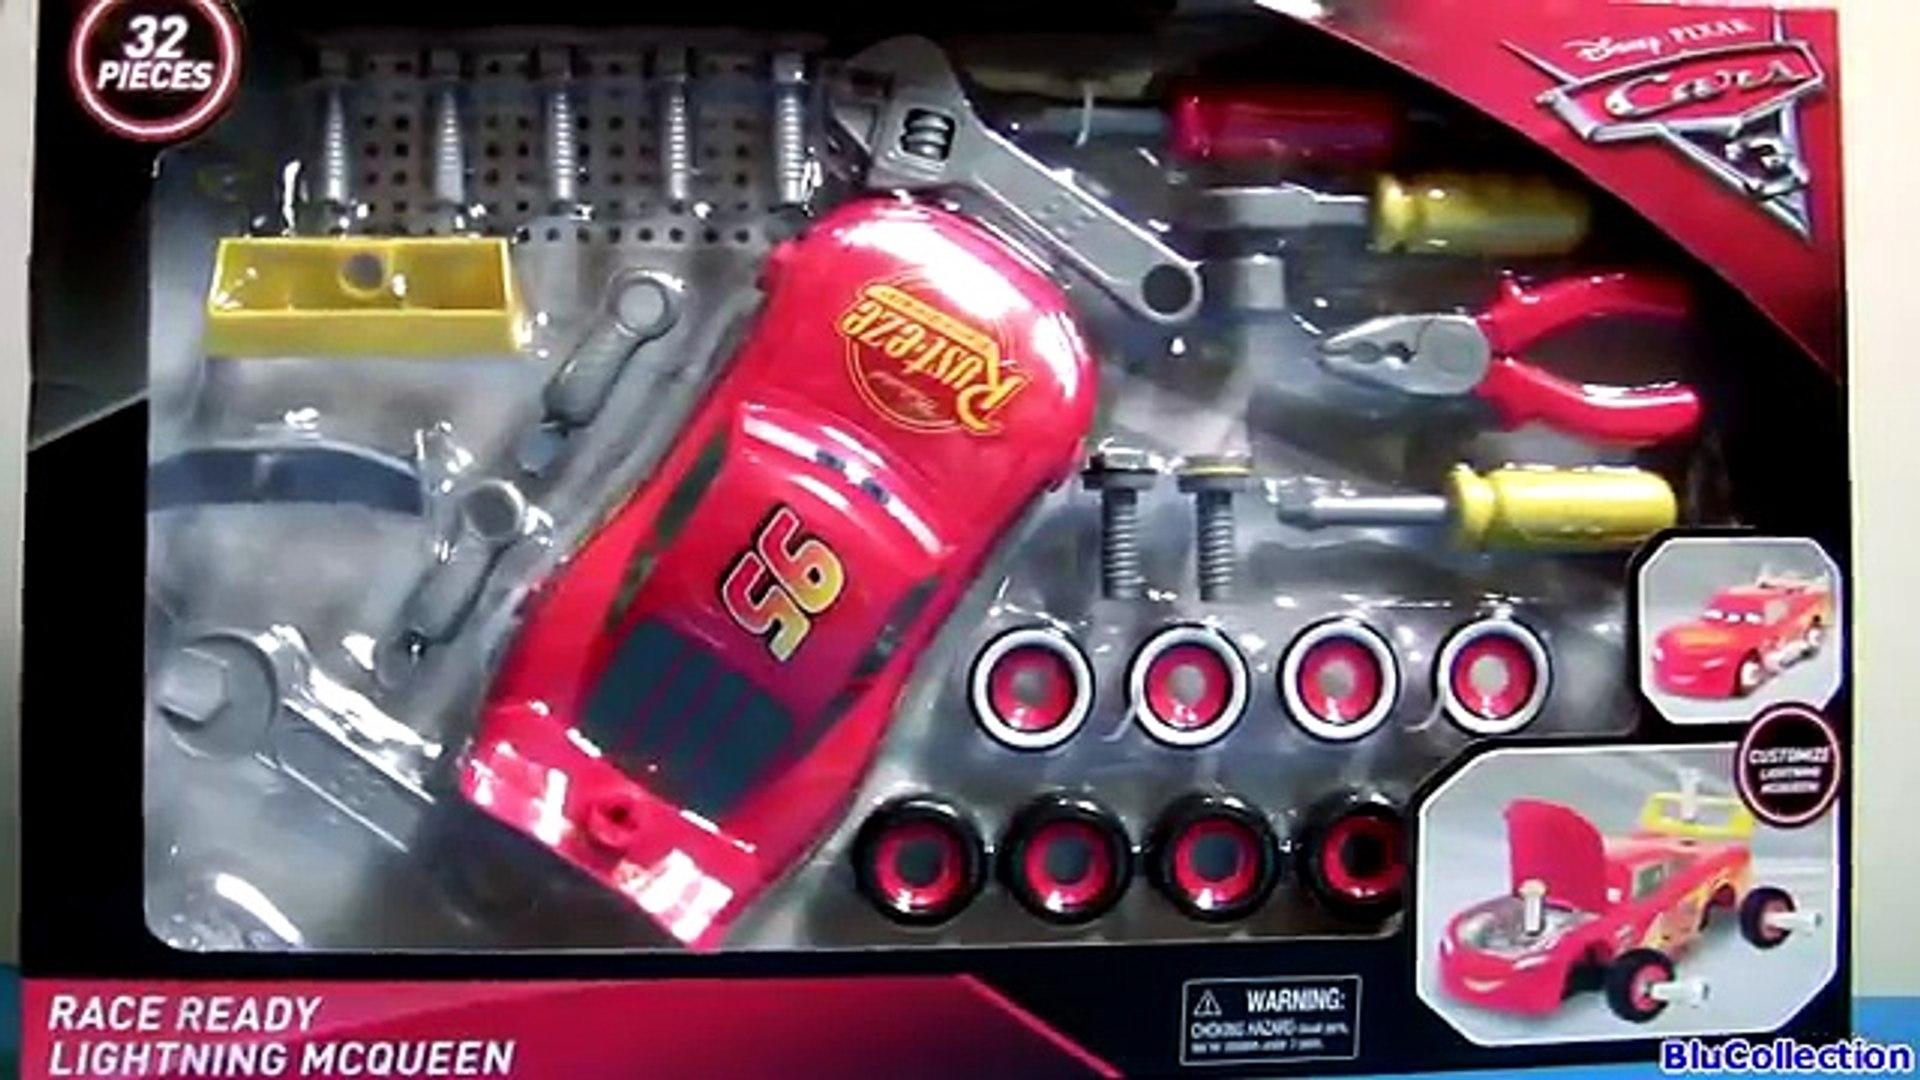 Cars 3 Race Ready Take Apart Lightning Mcqueen Toy Transforming Tool Kit Center 2017 Disney Toys